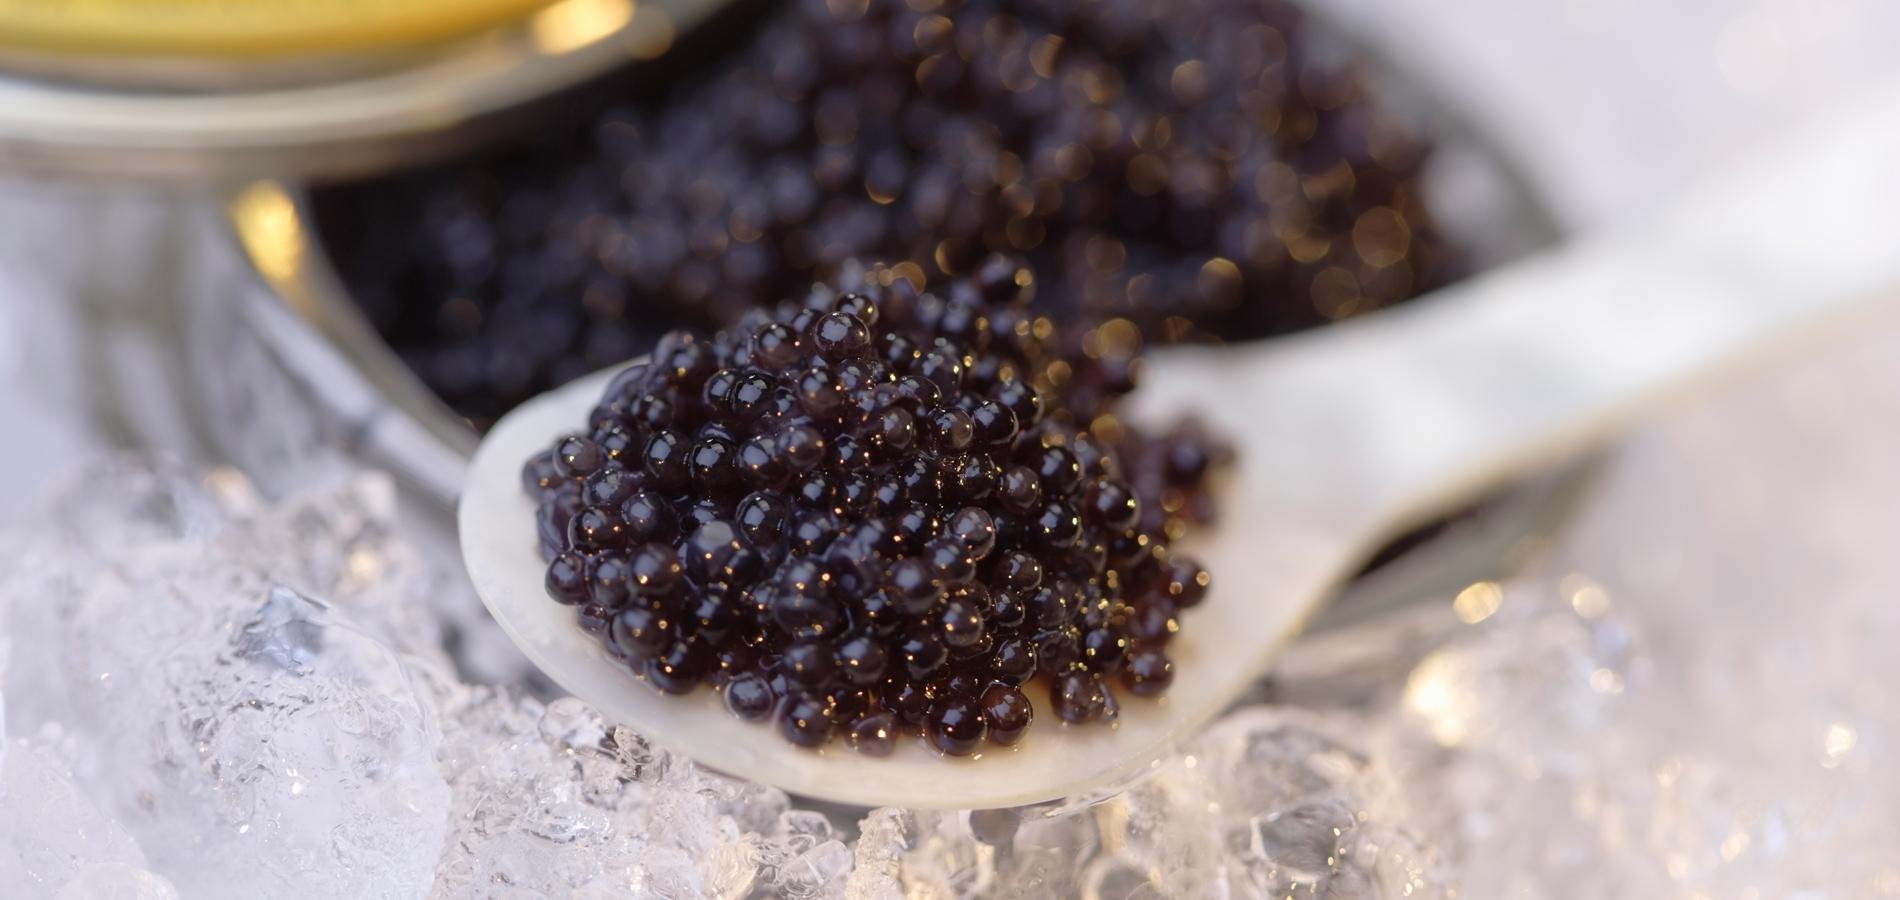 maison du caviar paris stunning caviar lyon caviar paris la maison du caviar comment manger du. Black Bedroom Furniture Sets. Home Design Ideas